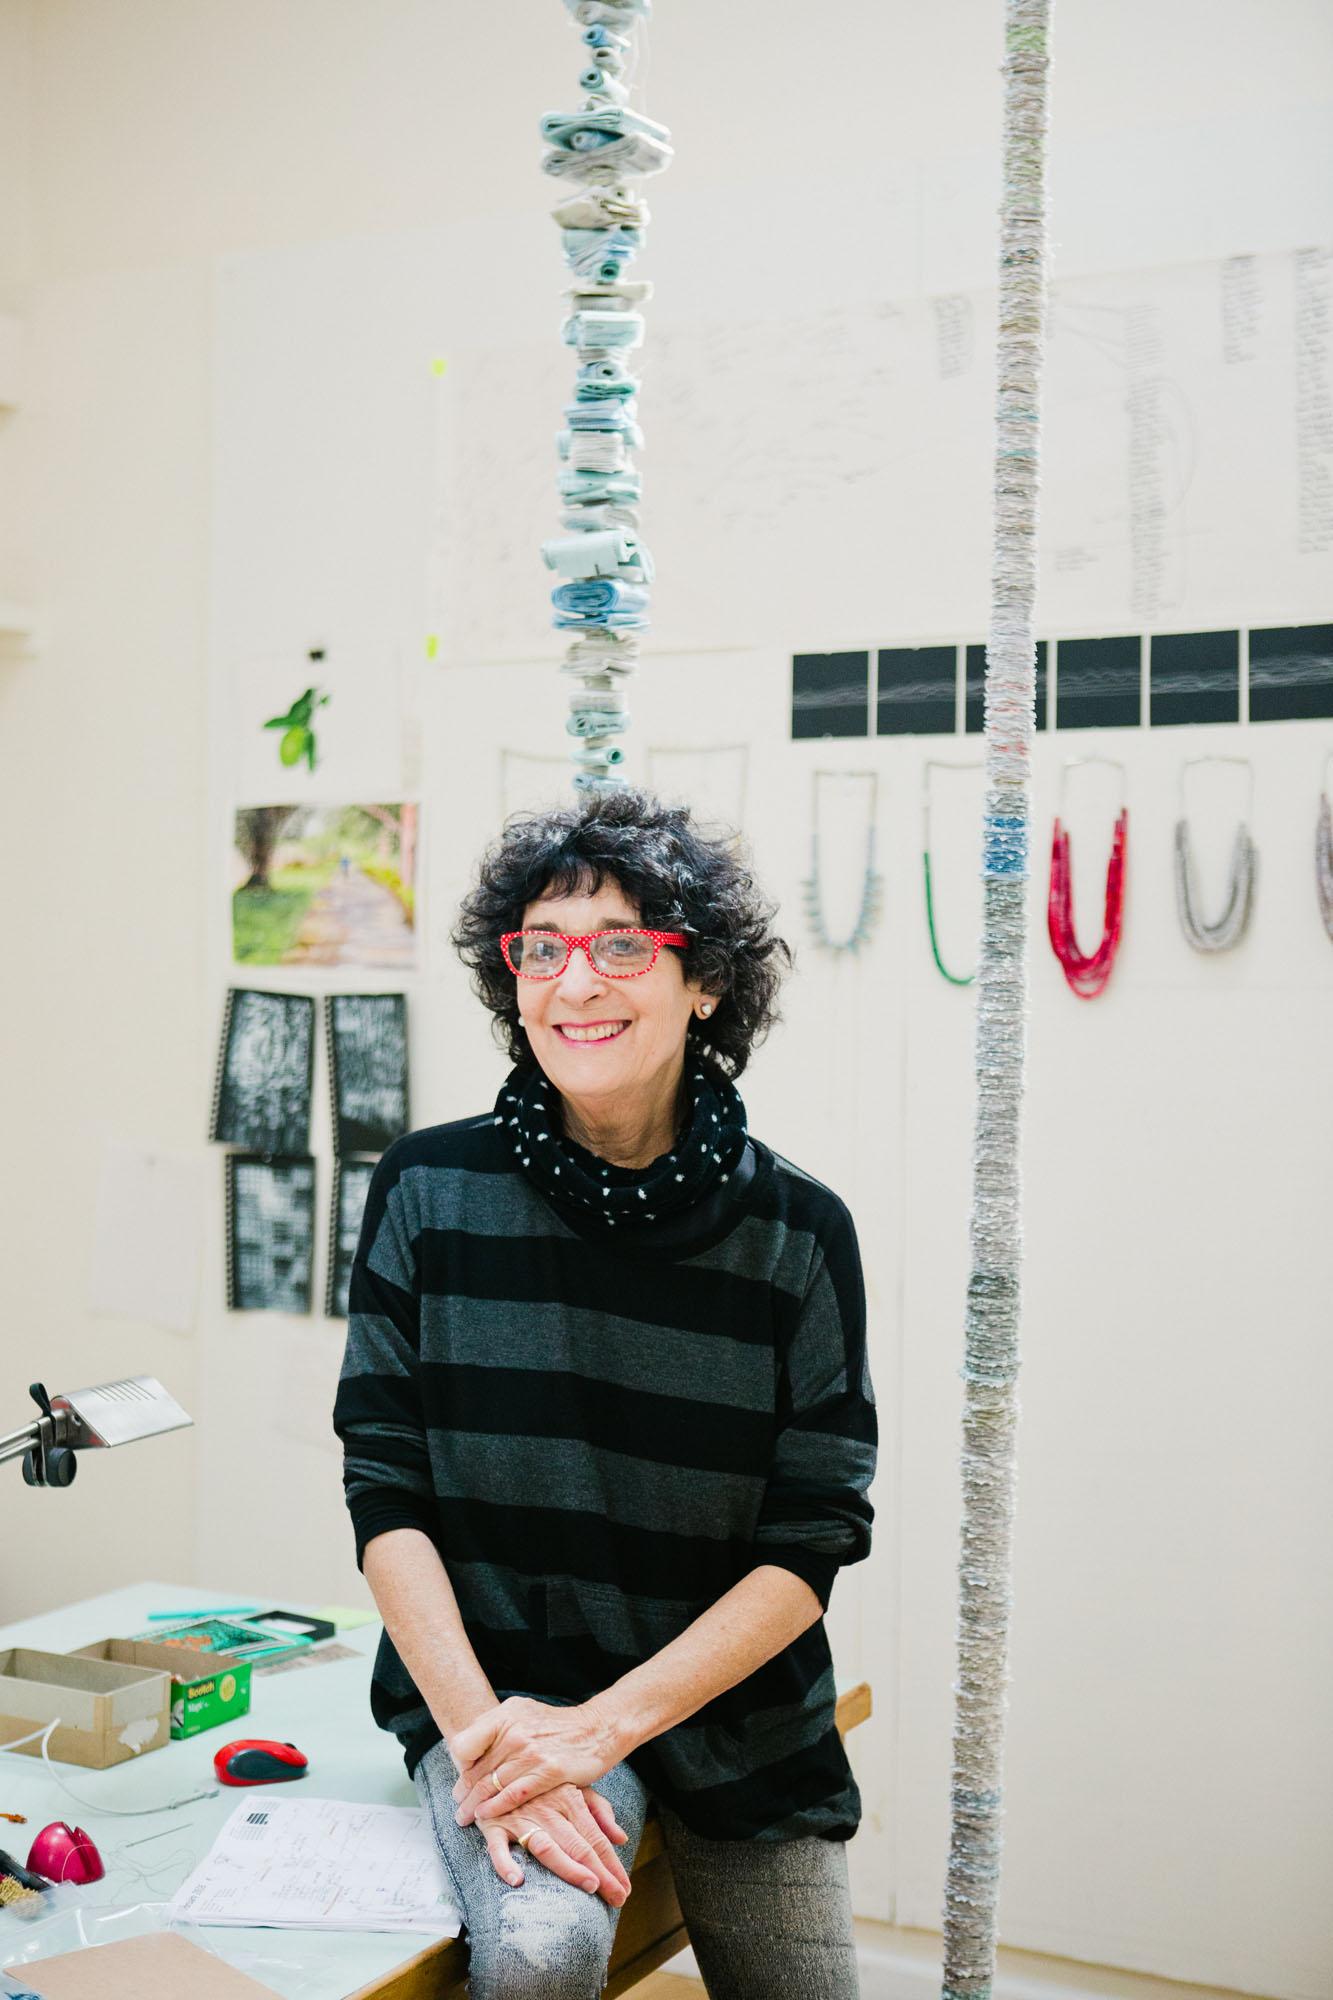 DaniellaWolfe-santa-cruz-artist-branding.jpg